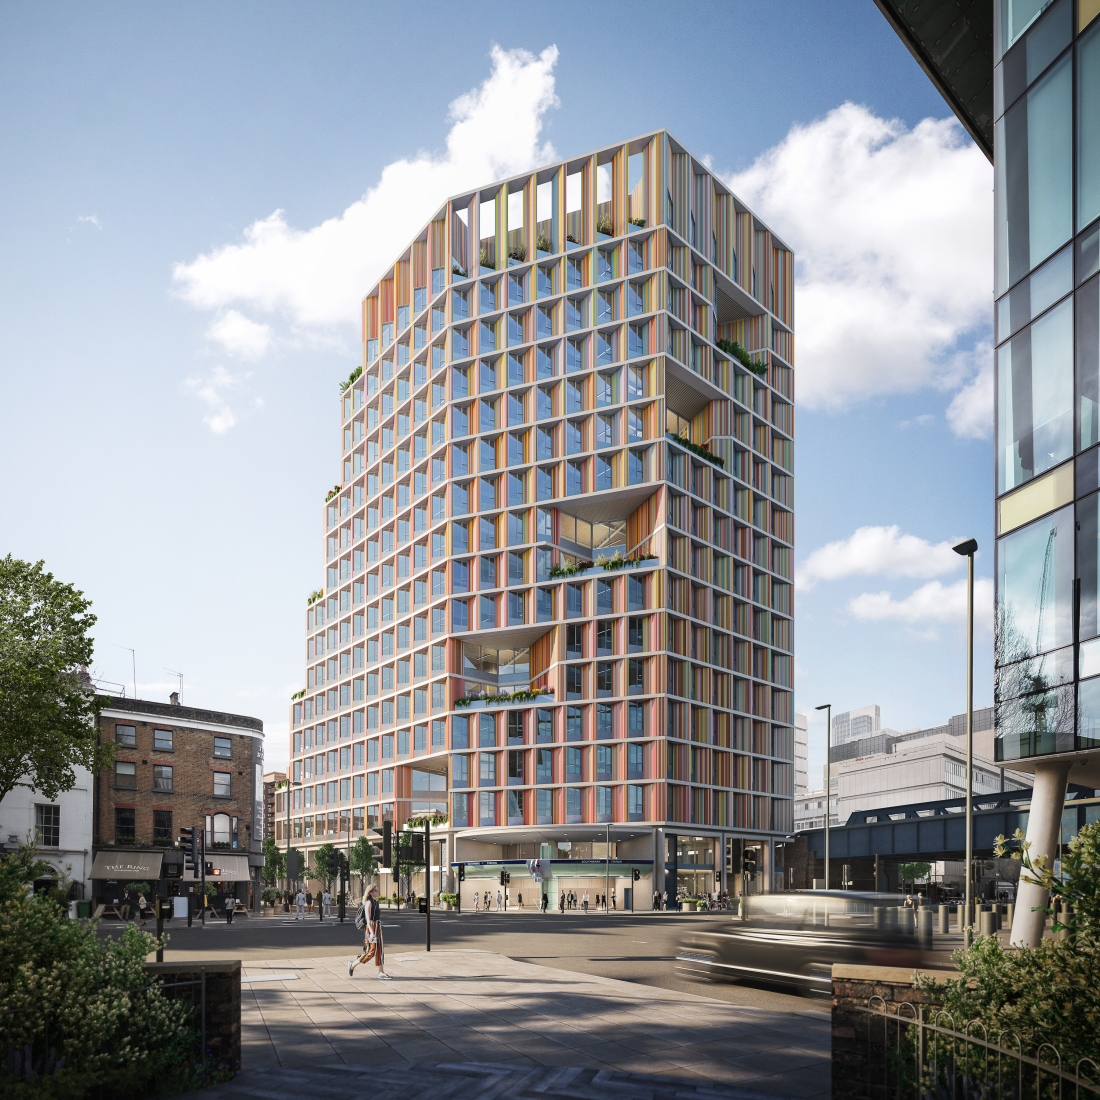 Proposals for Southwark Tube Over Site Development. Credit: AHMM/ Hayes Davidson